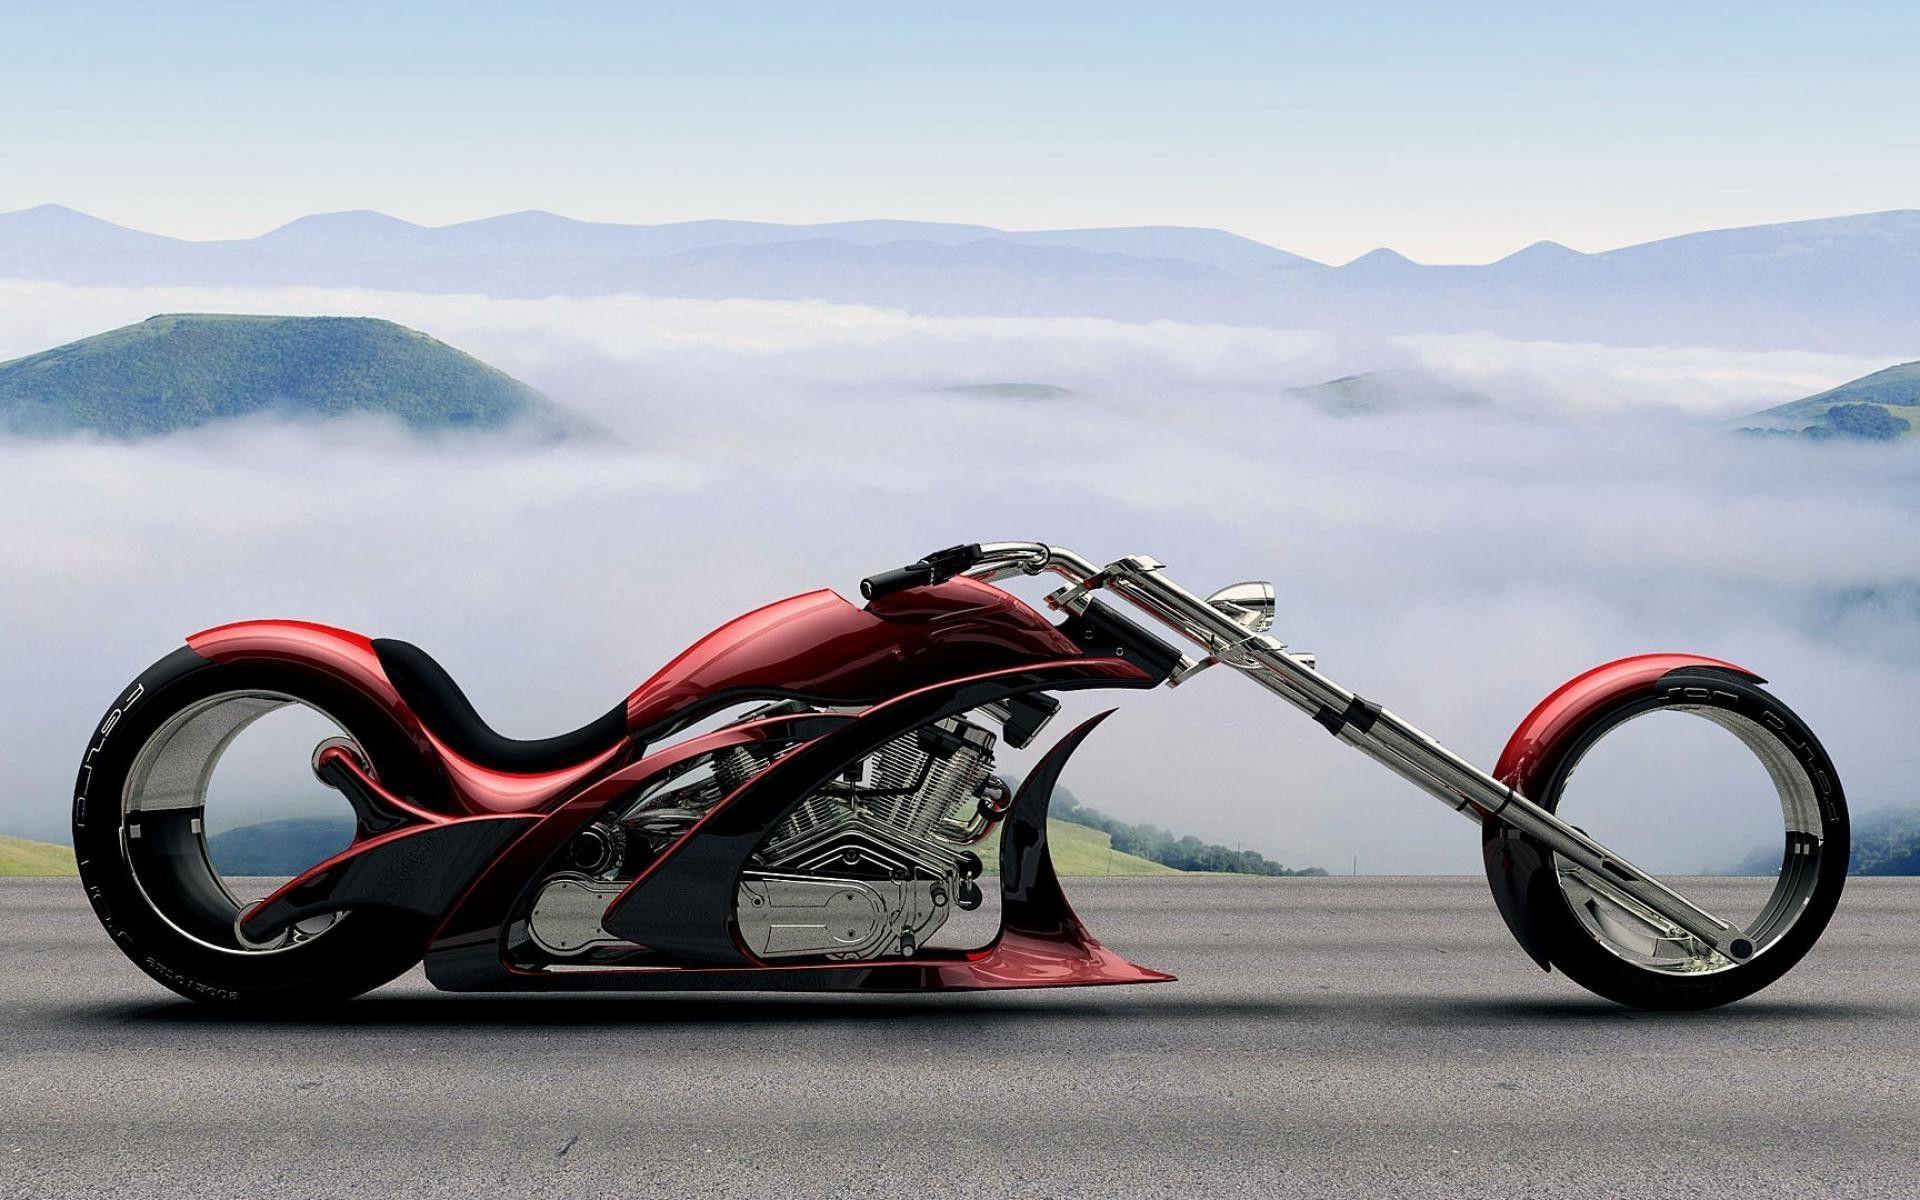 Lamborbiker 1 画像あり 自転車のデザイン 壁紙 Pcデスクトップ